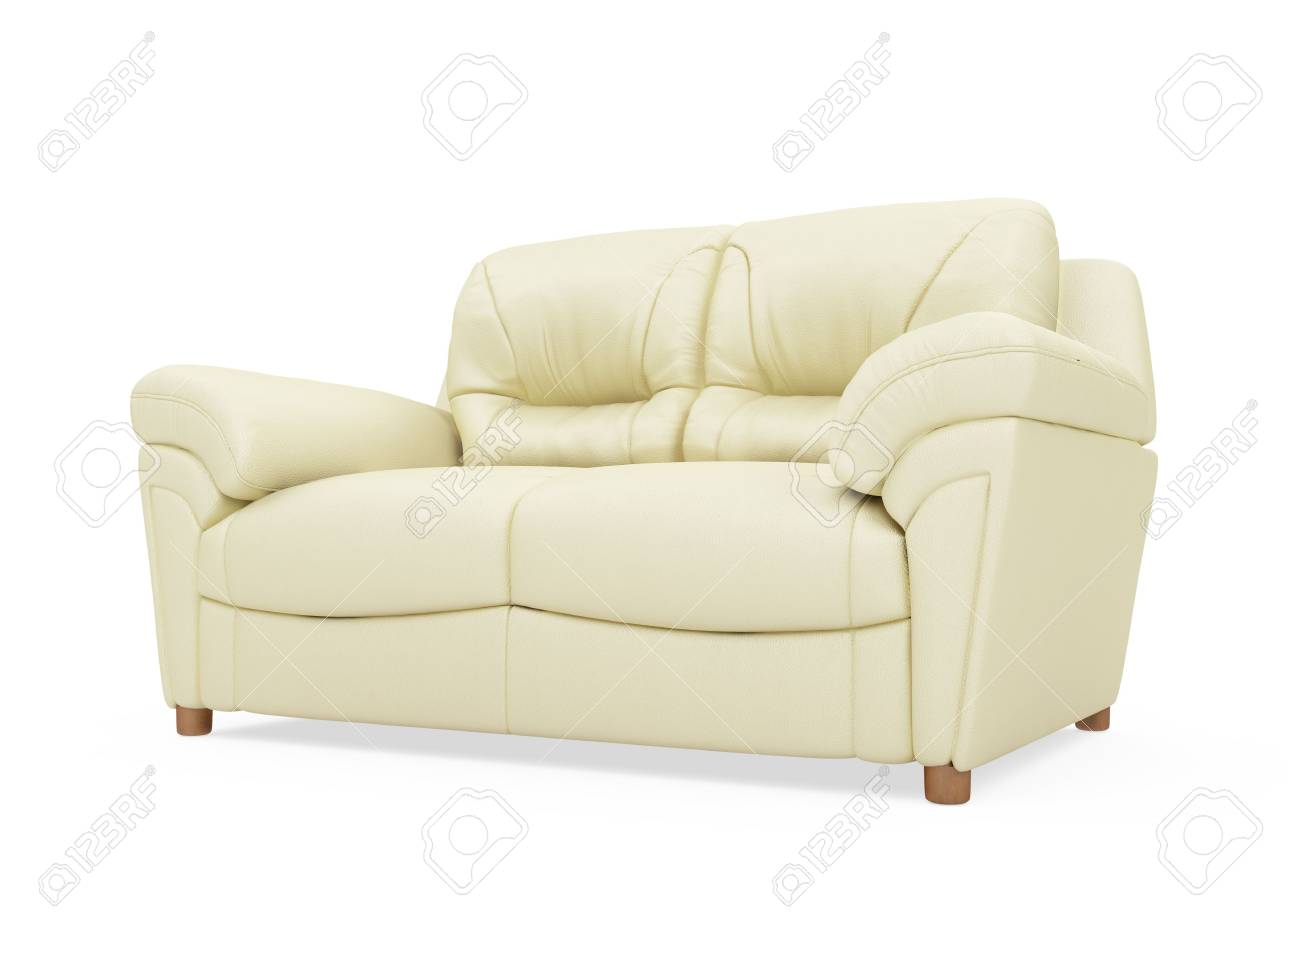 isolated beige sofa over white background Stock Photo - 5013678